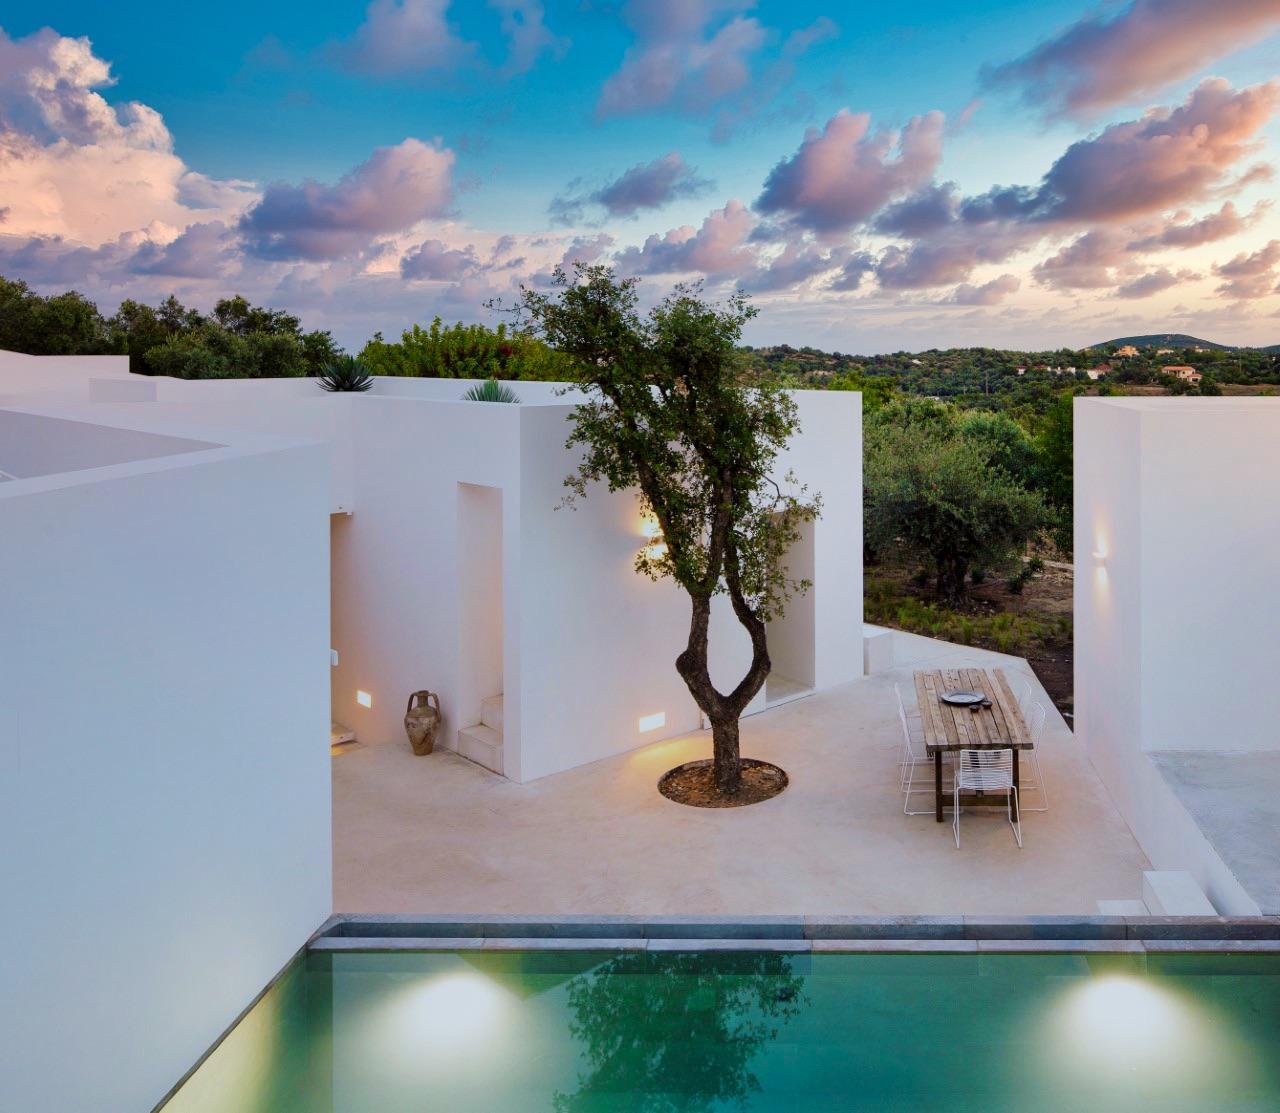 Zalig-Algarve-Casa-Luum-250-1_1b